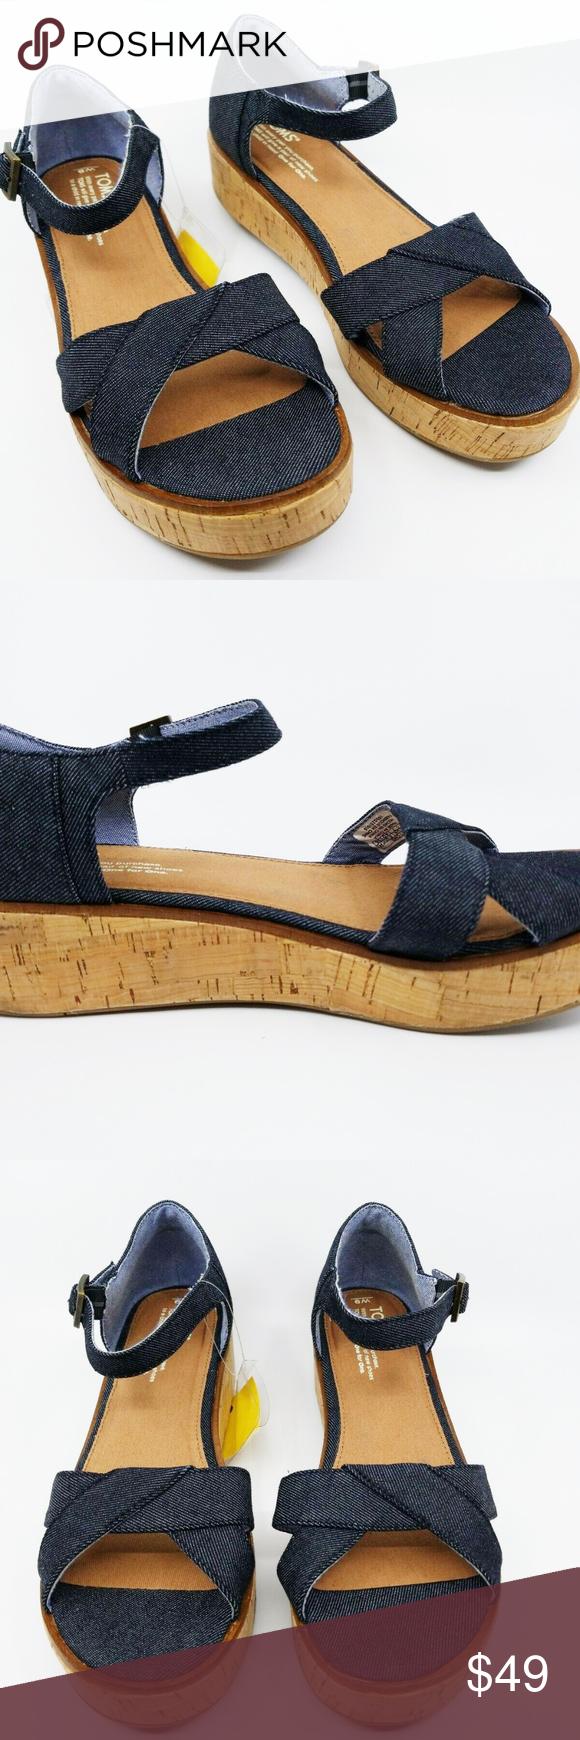 ec7677b0eb2c Toms Womens Harper Wedge Black Denim Sandals US 9 Ankle strap with an  adjustable metal buckle